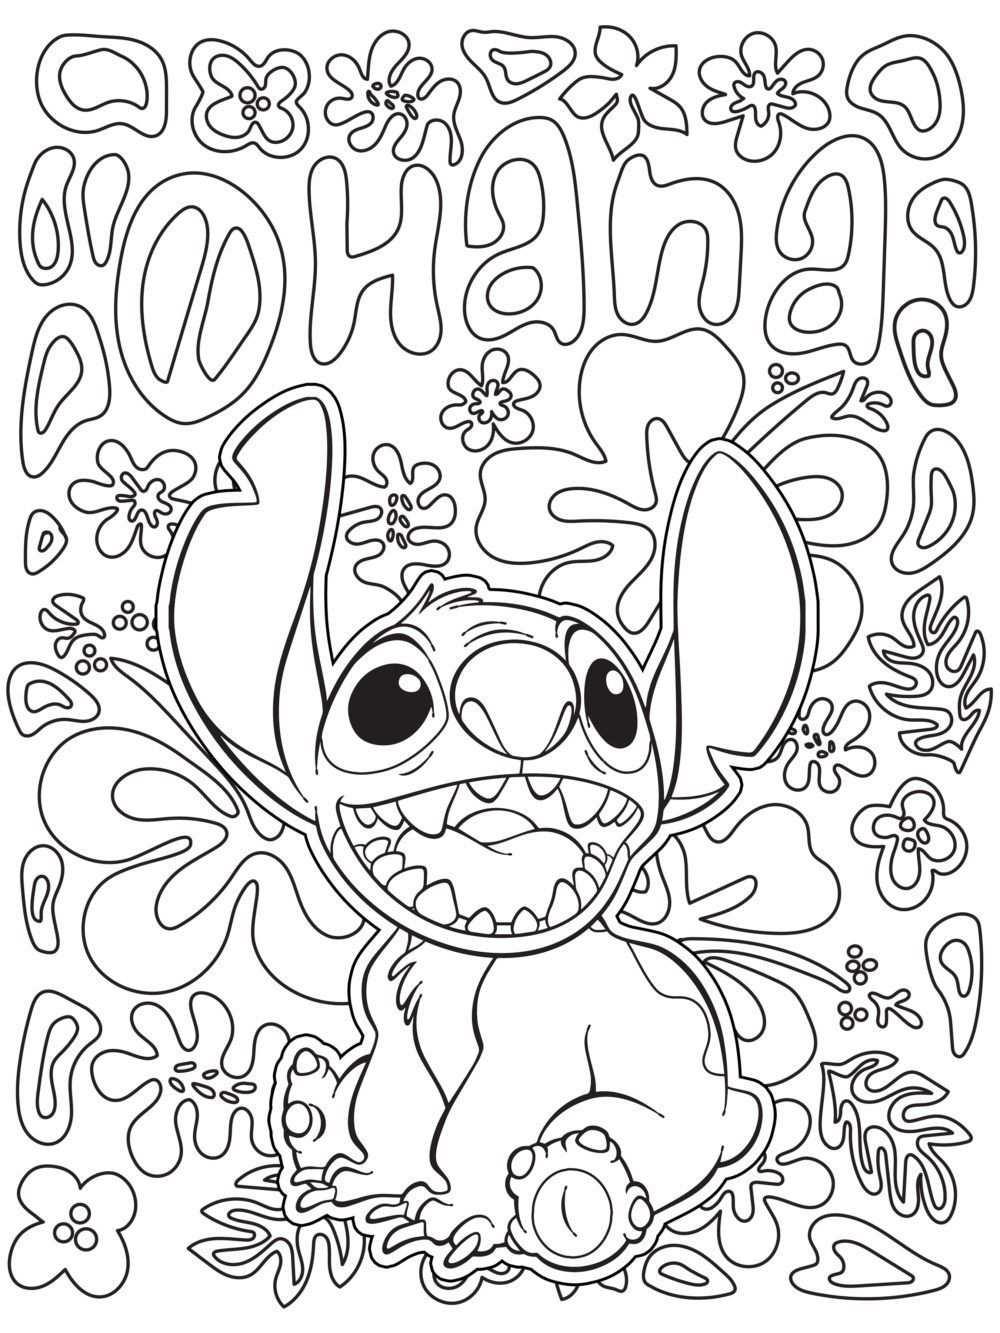 kleurplaat disney stitch